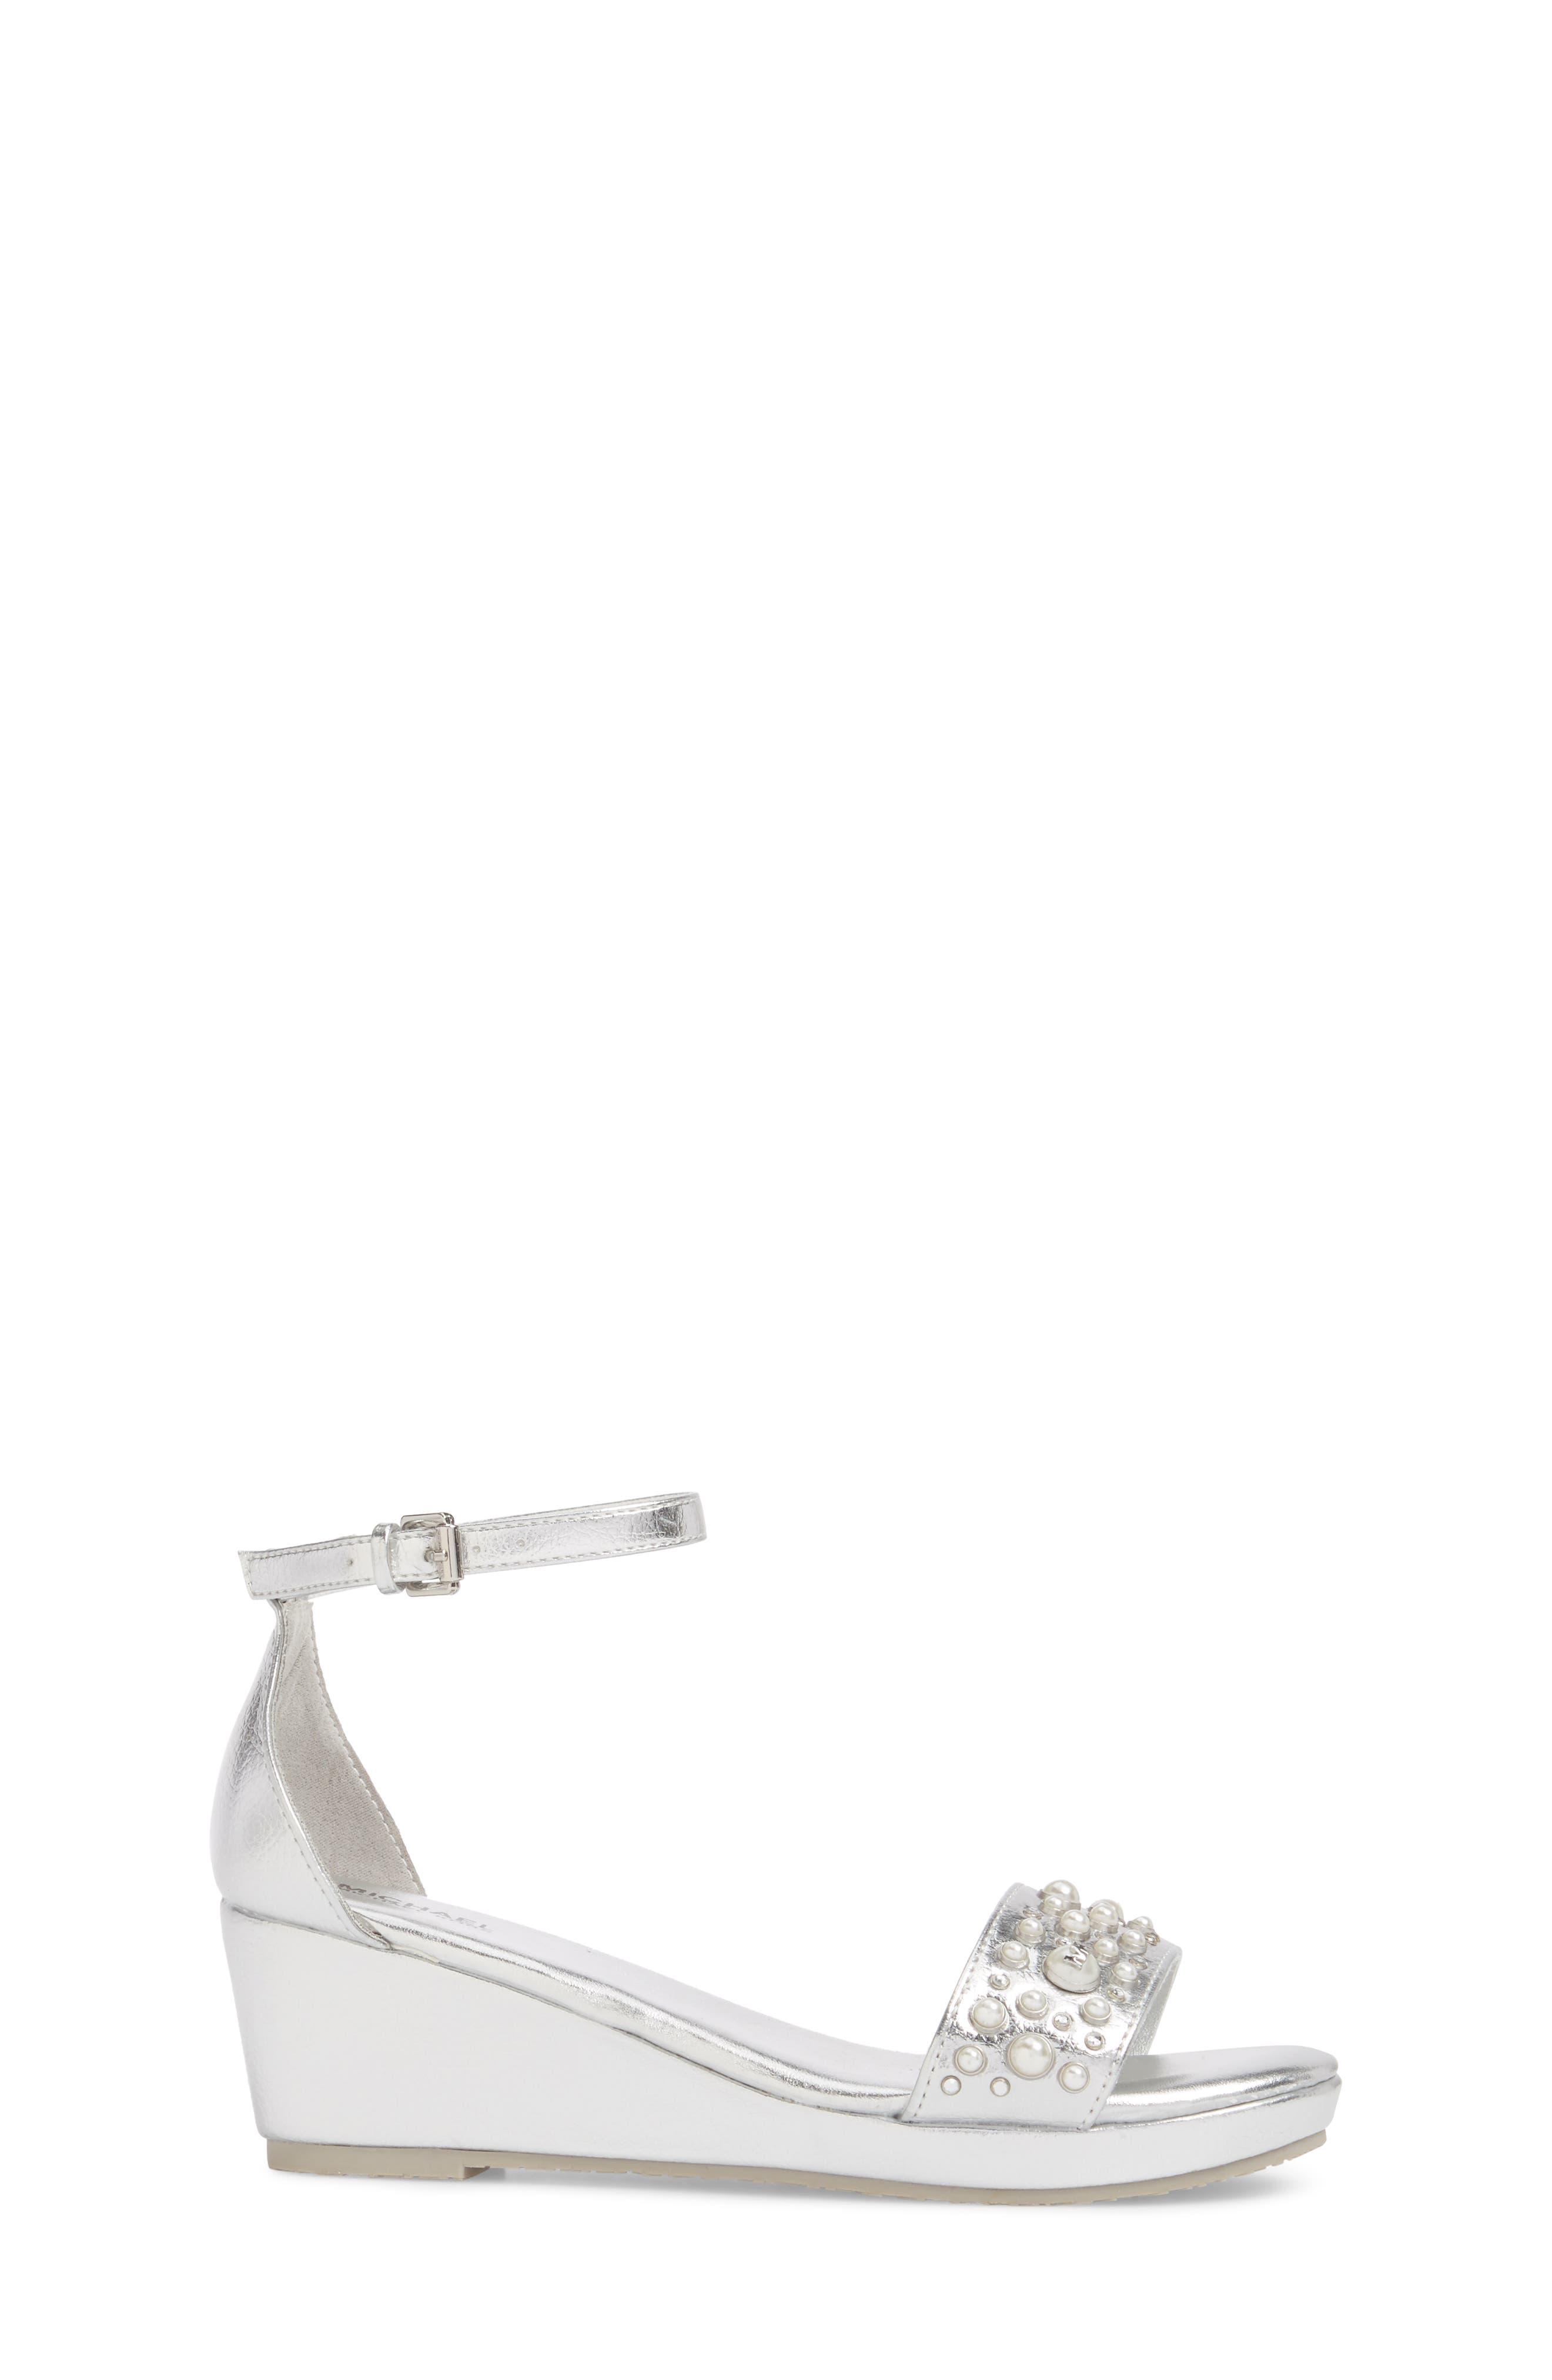 Cate Embellished Wedge Sandal,                             Alternate thumbnail 3, color,                             Silver